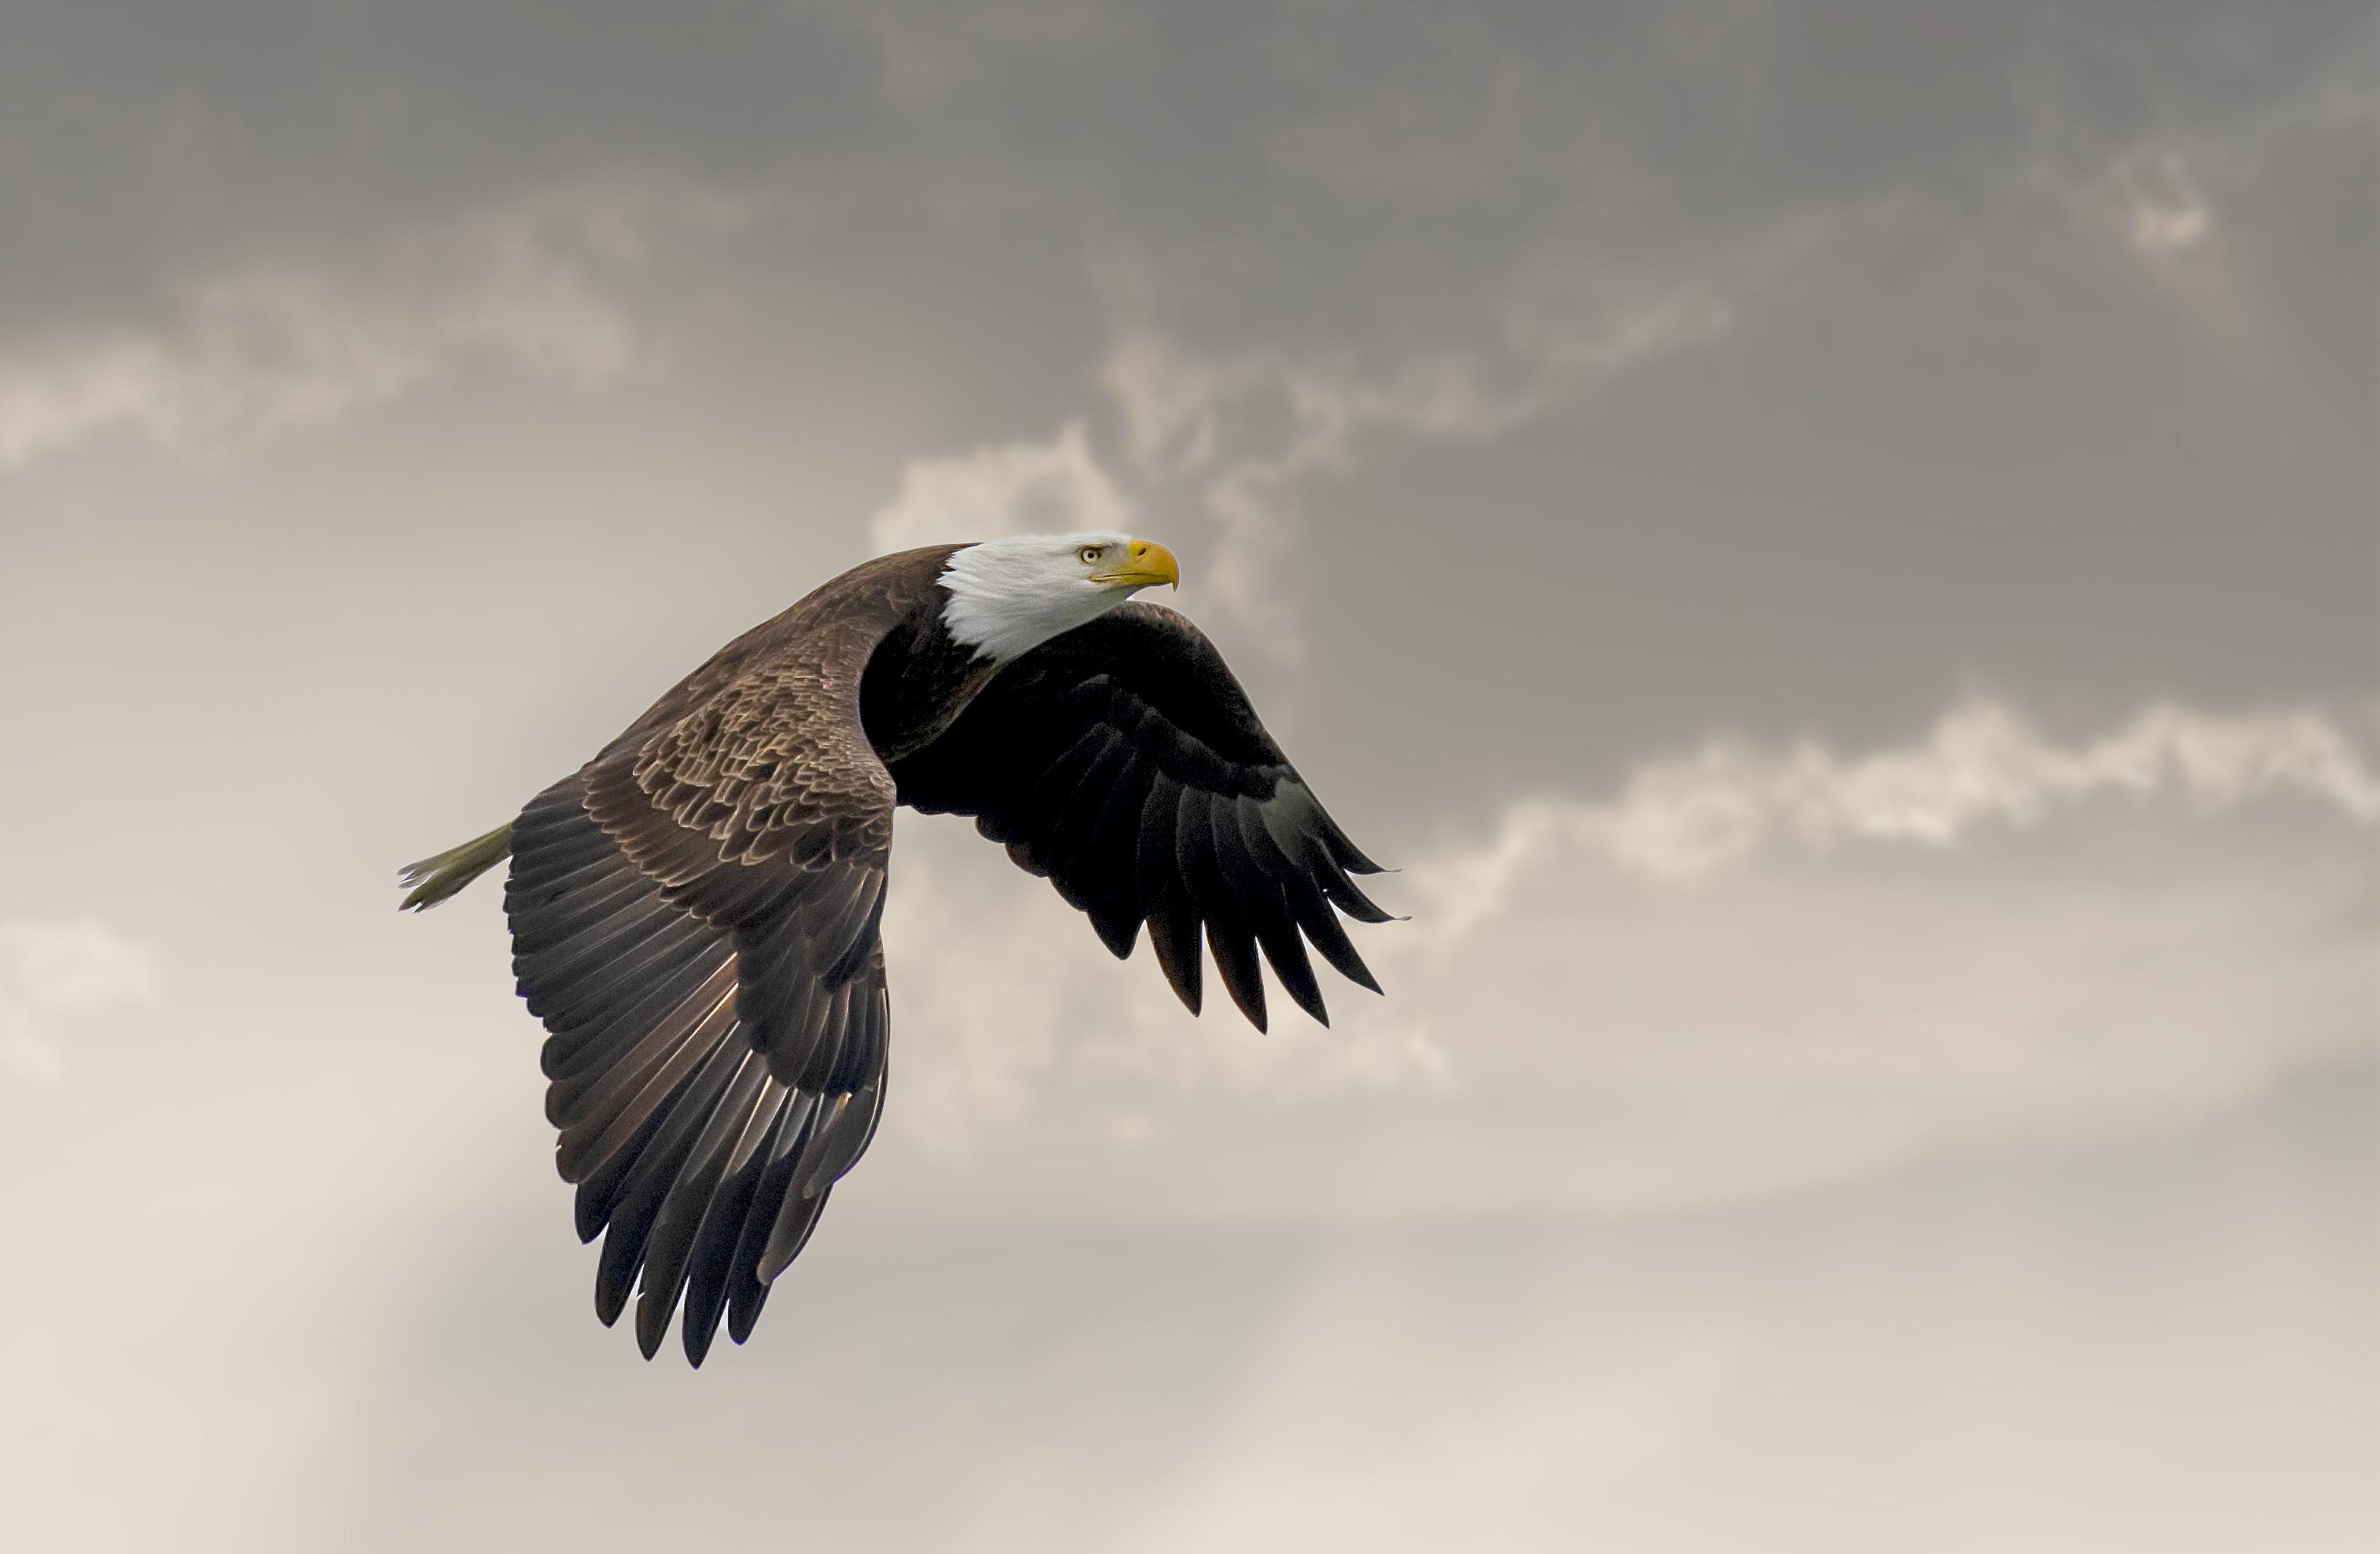 Eagle-in-flight-in-clouds